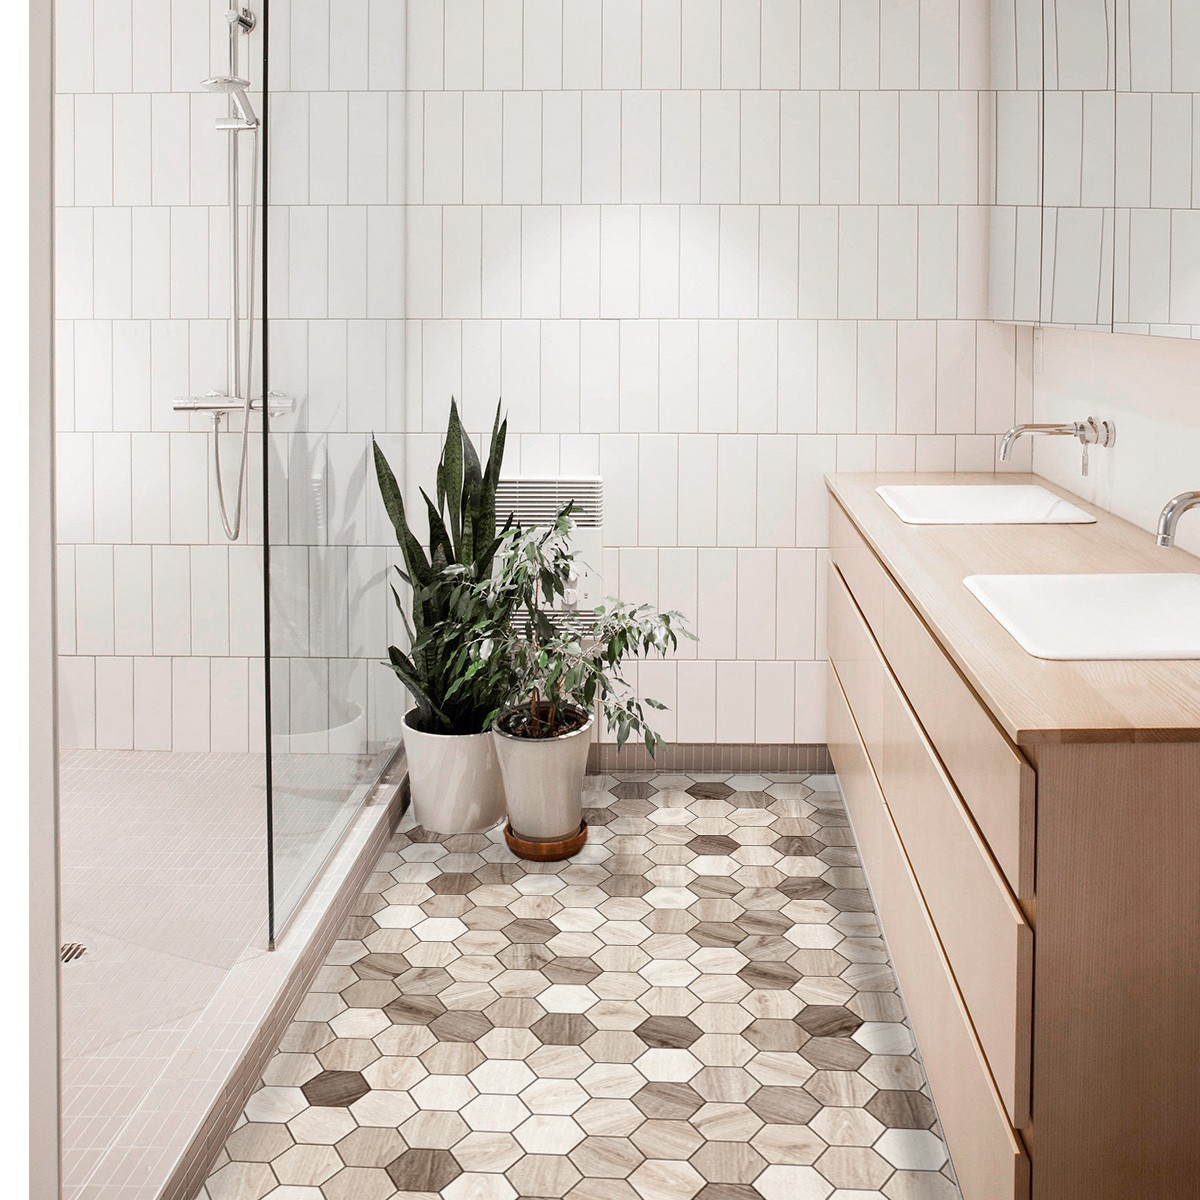 carrelage hexagonal sol salle de bain